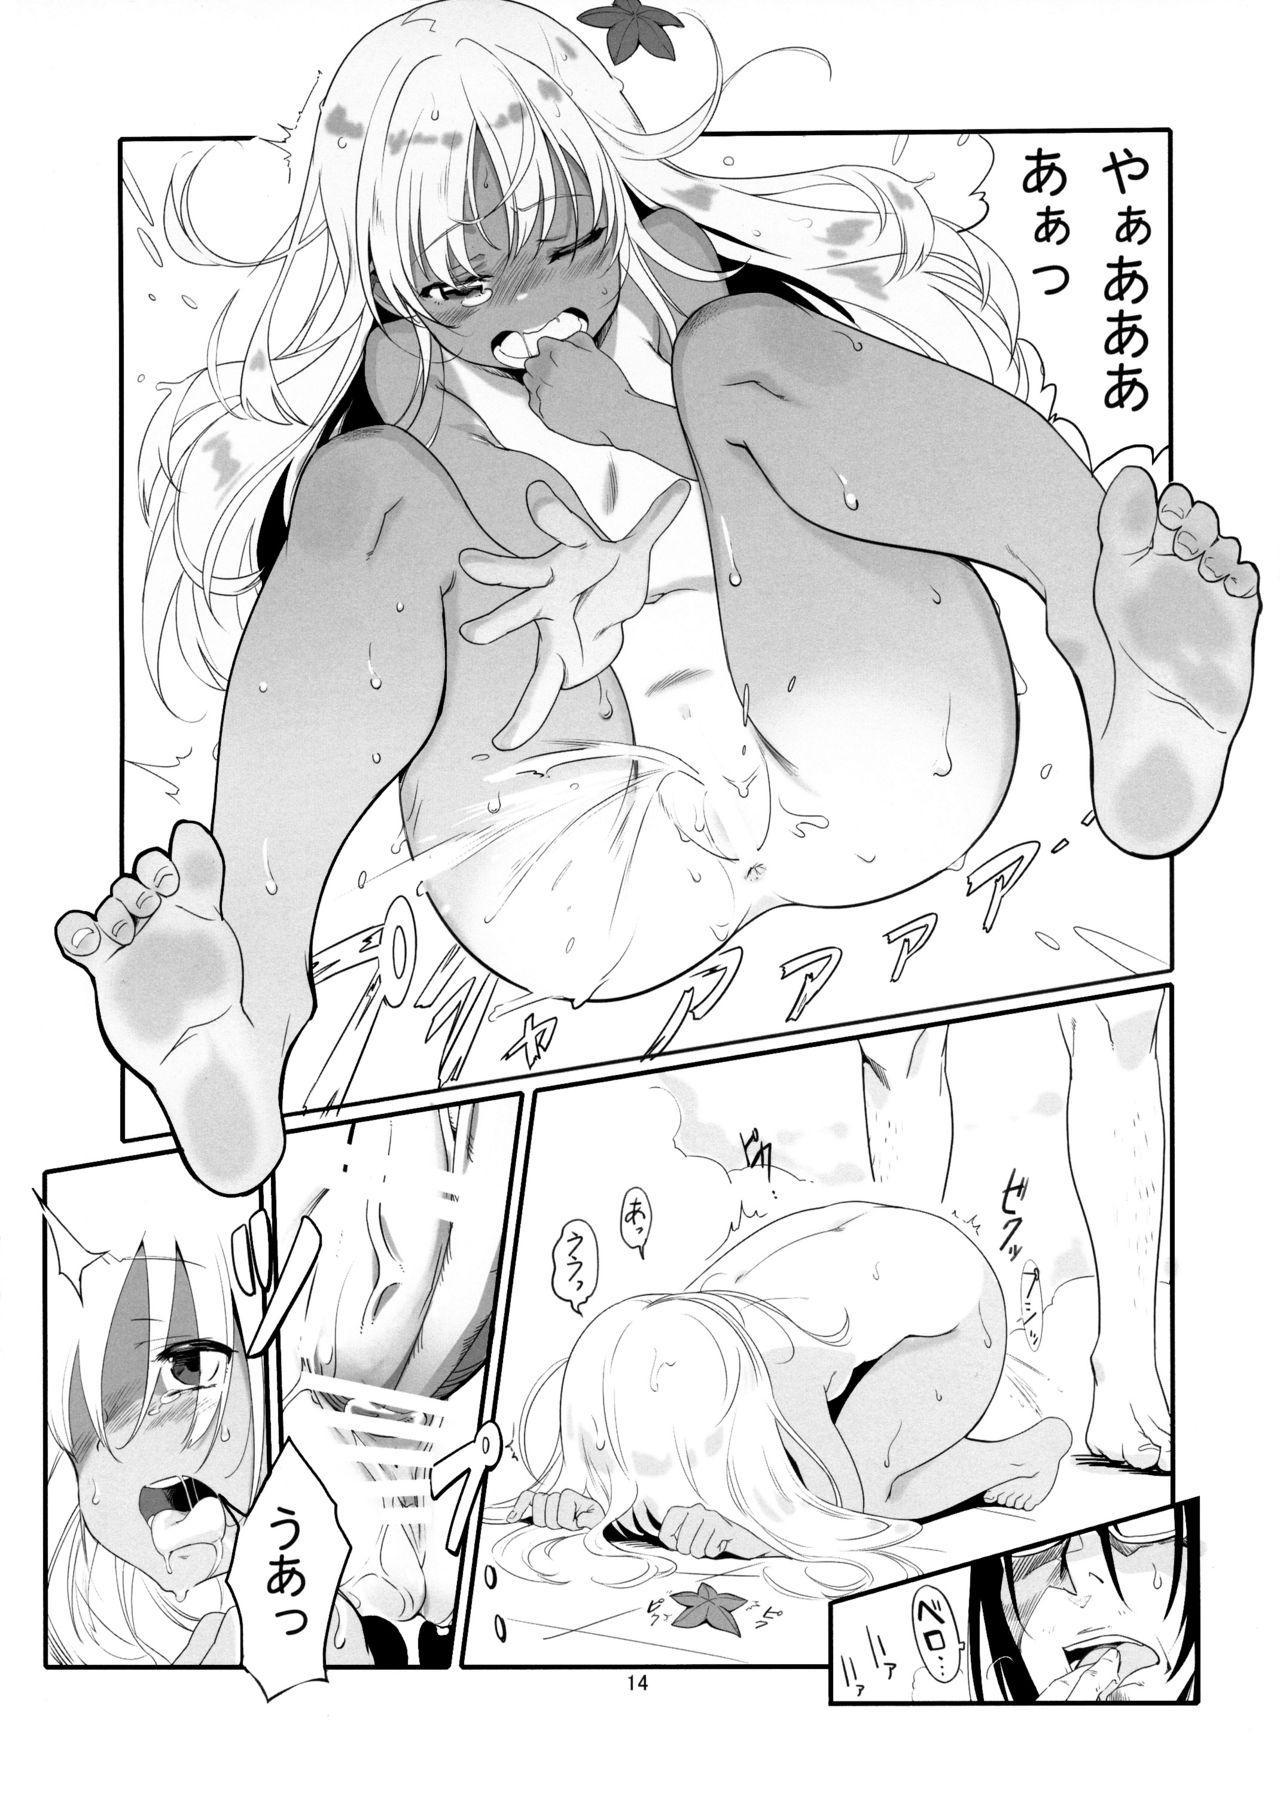 Ro-chan no Ofuro de Daisakusen 12